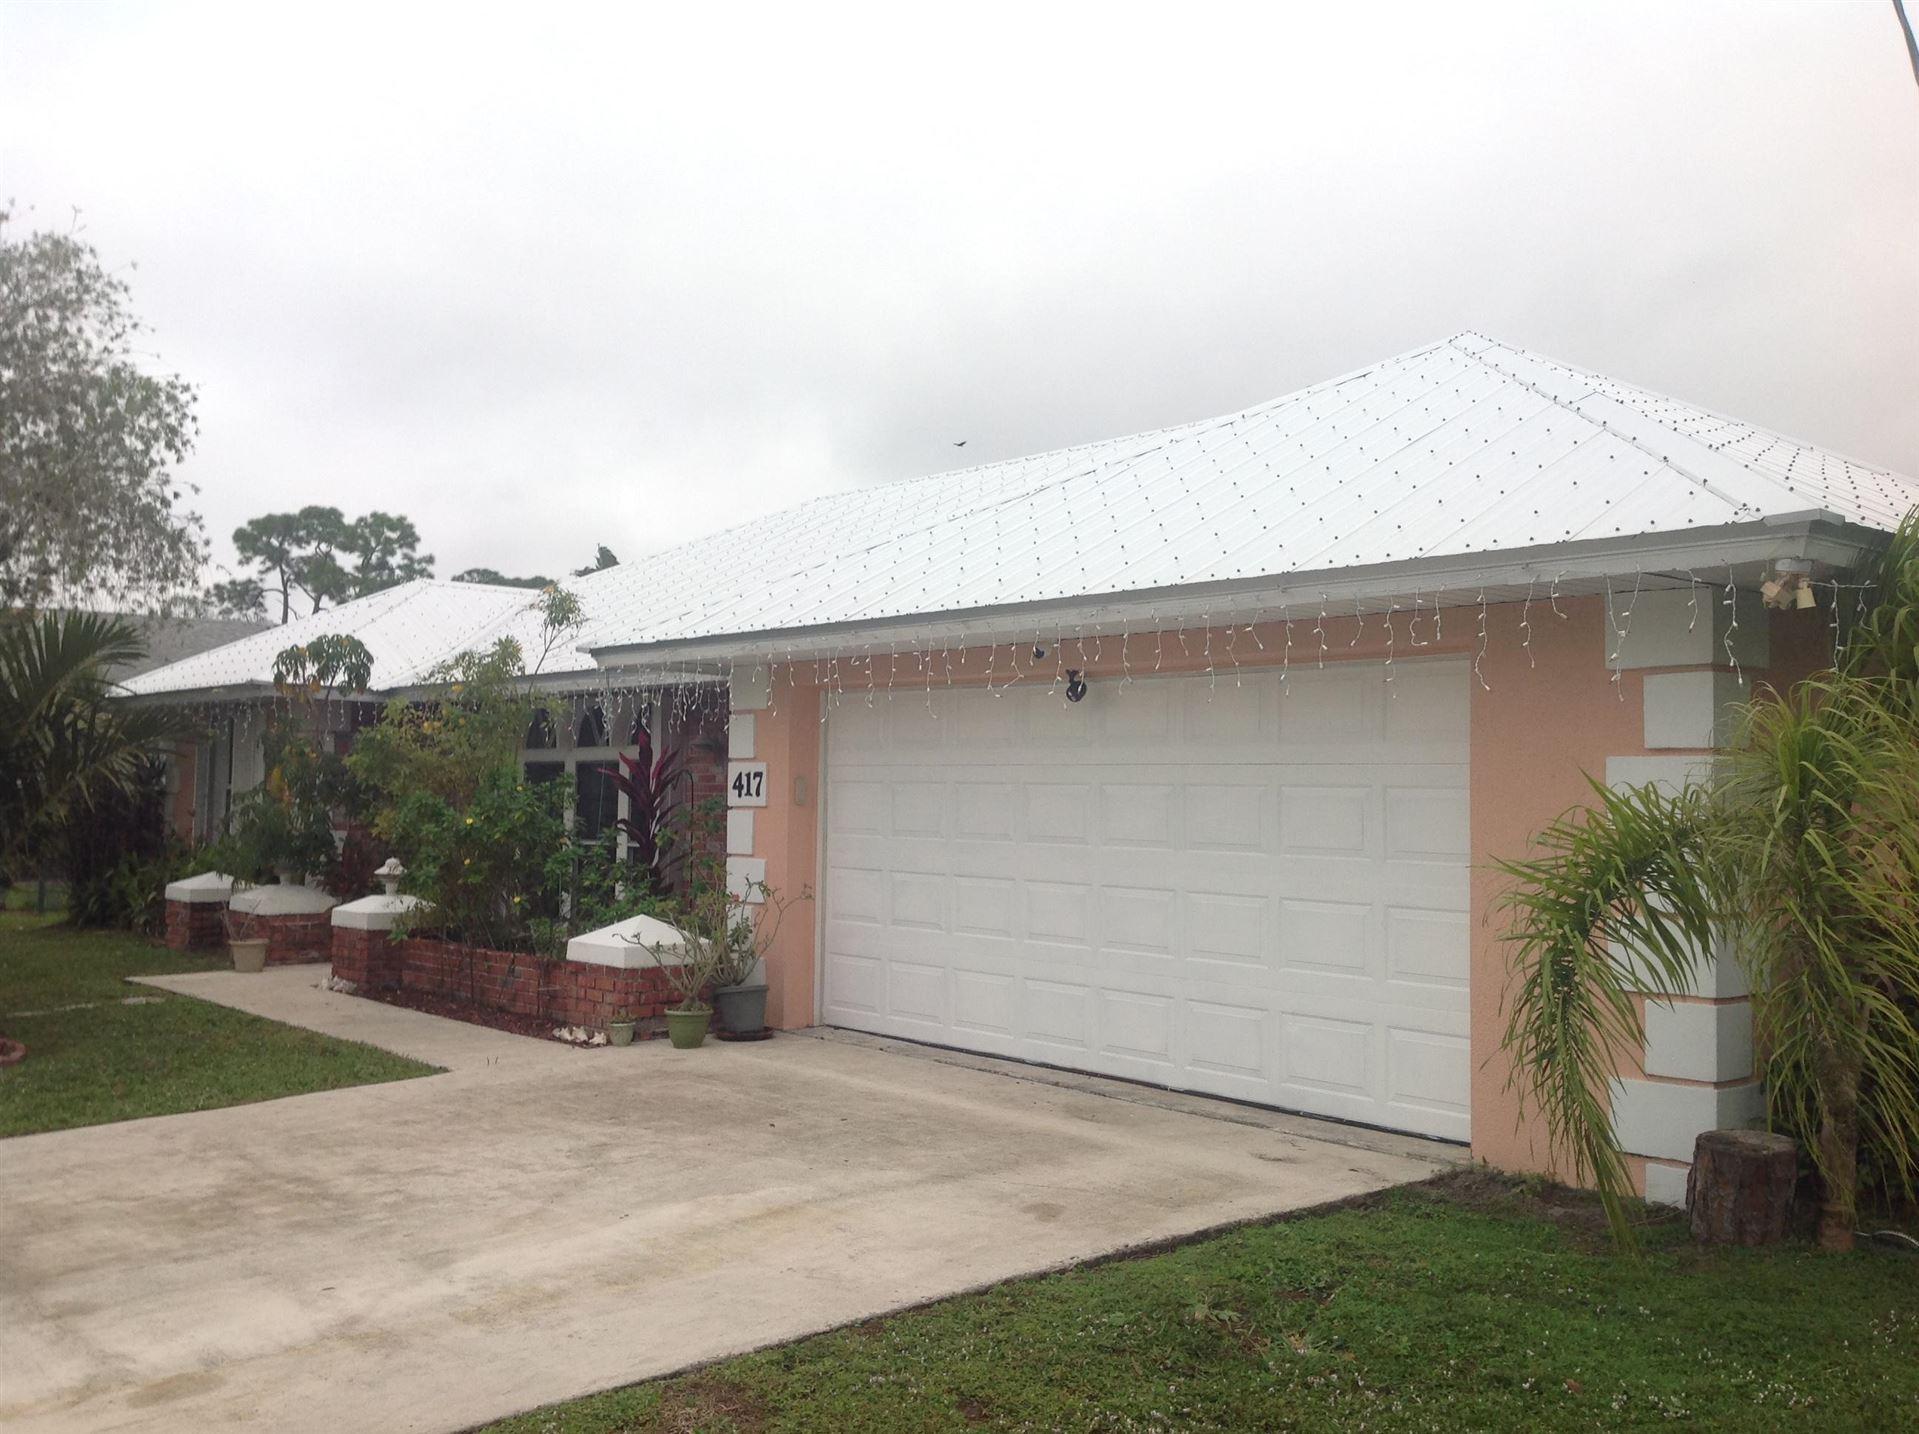 417 NE Midvale Street, Port Saint Lucie, FL 34983 - #: RX-10678459